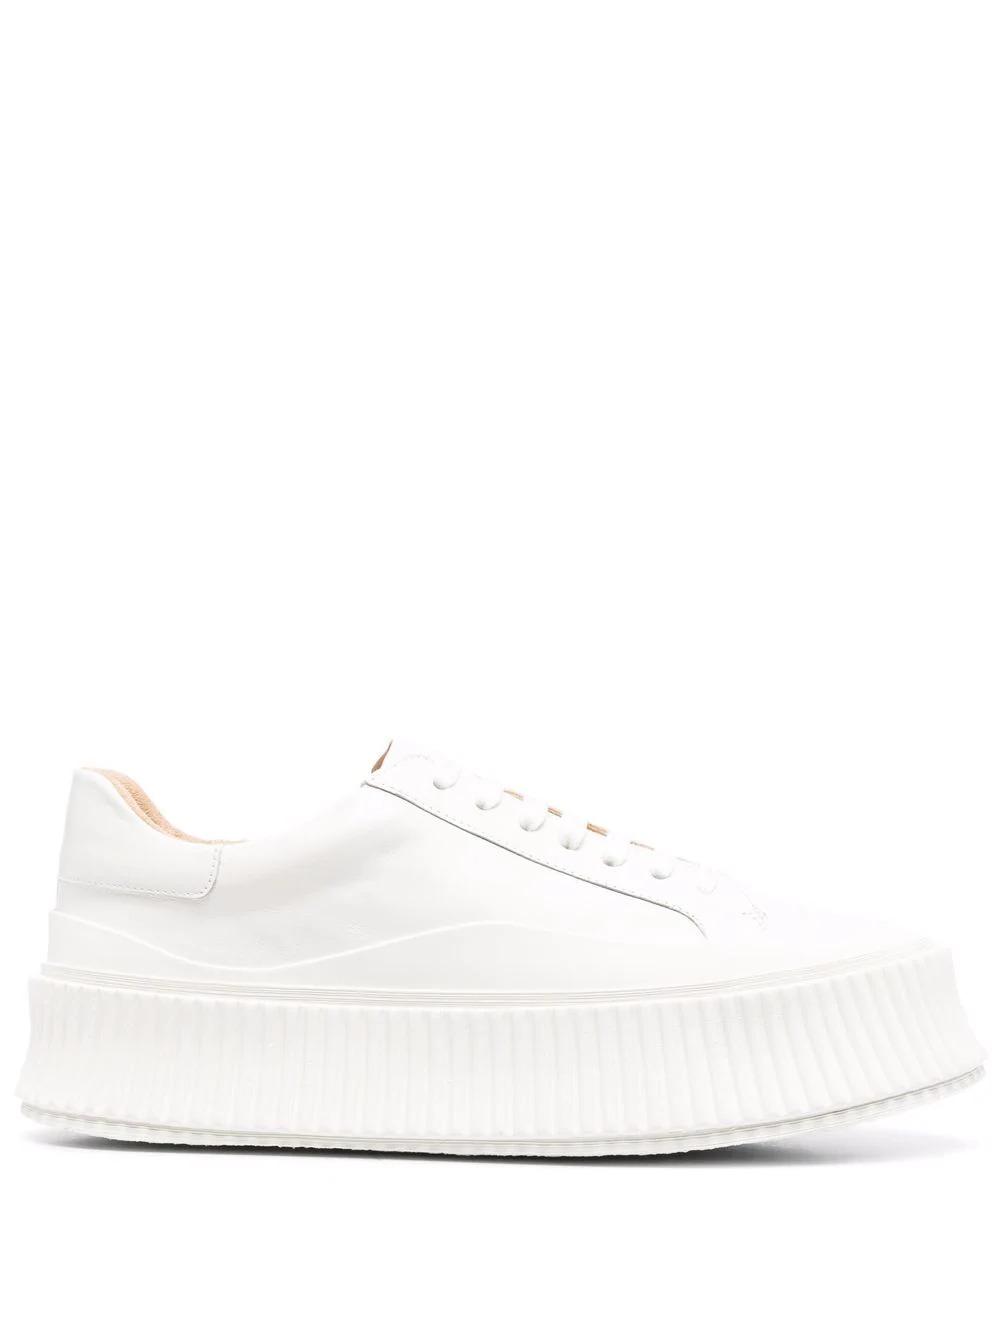 Chunky Low-Top-Sneaker in Weiß